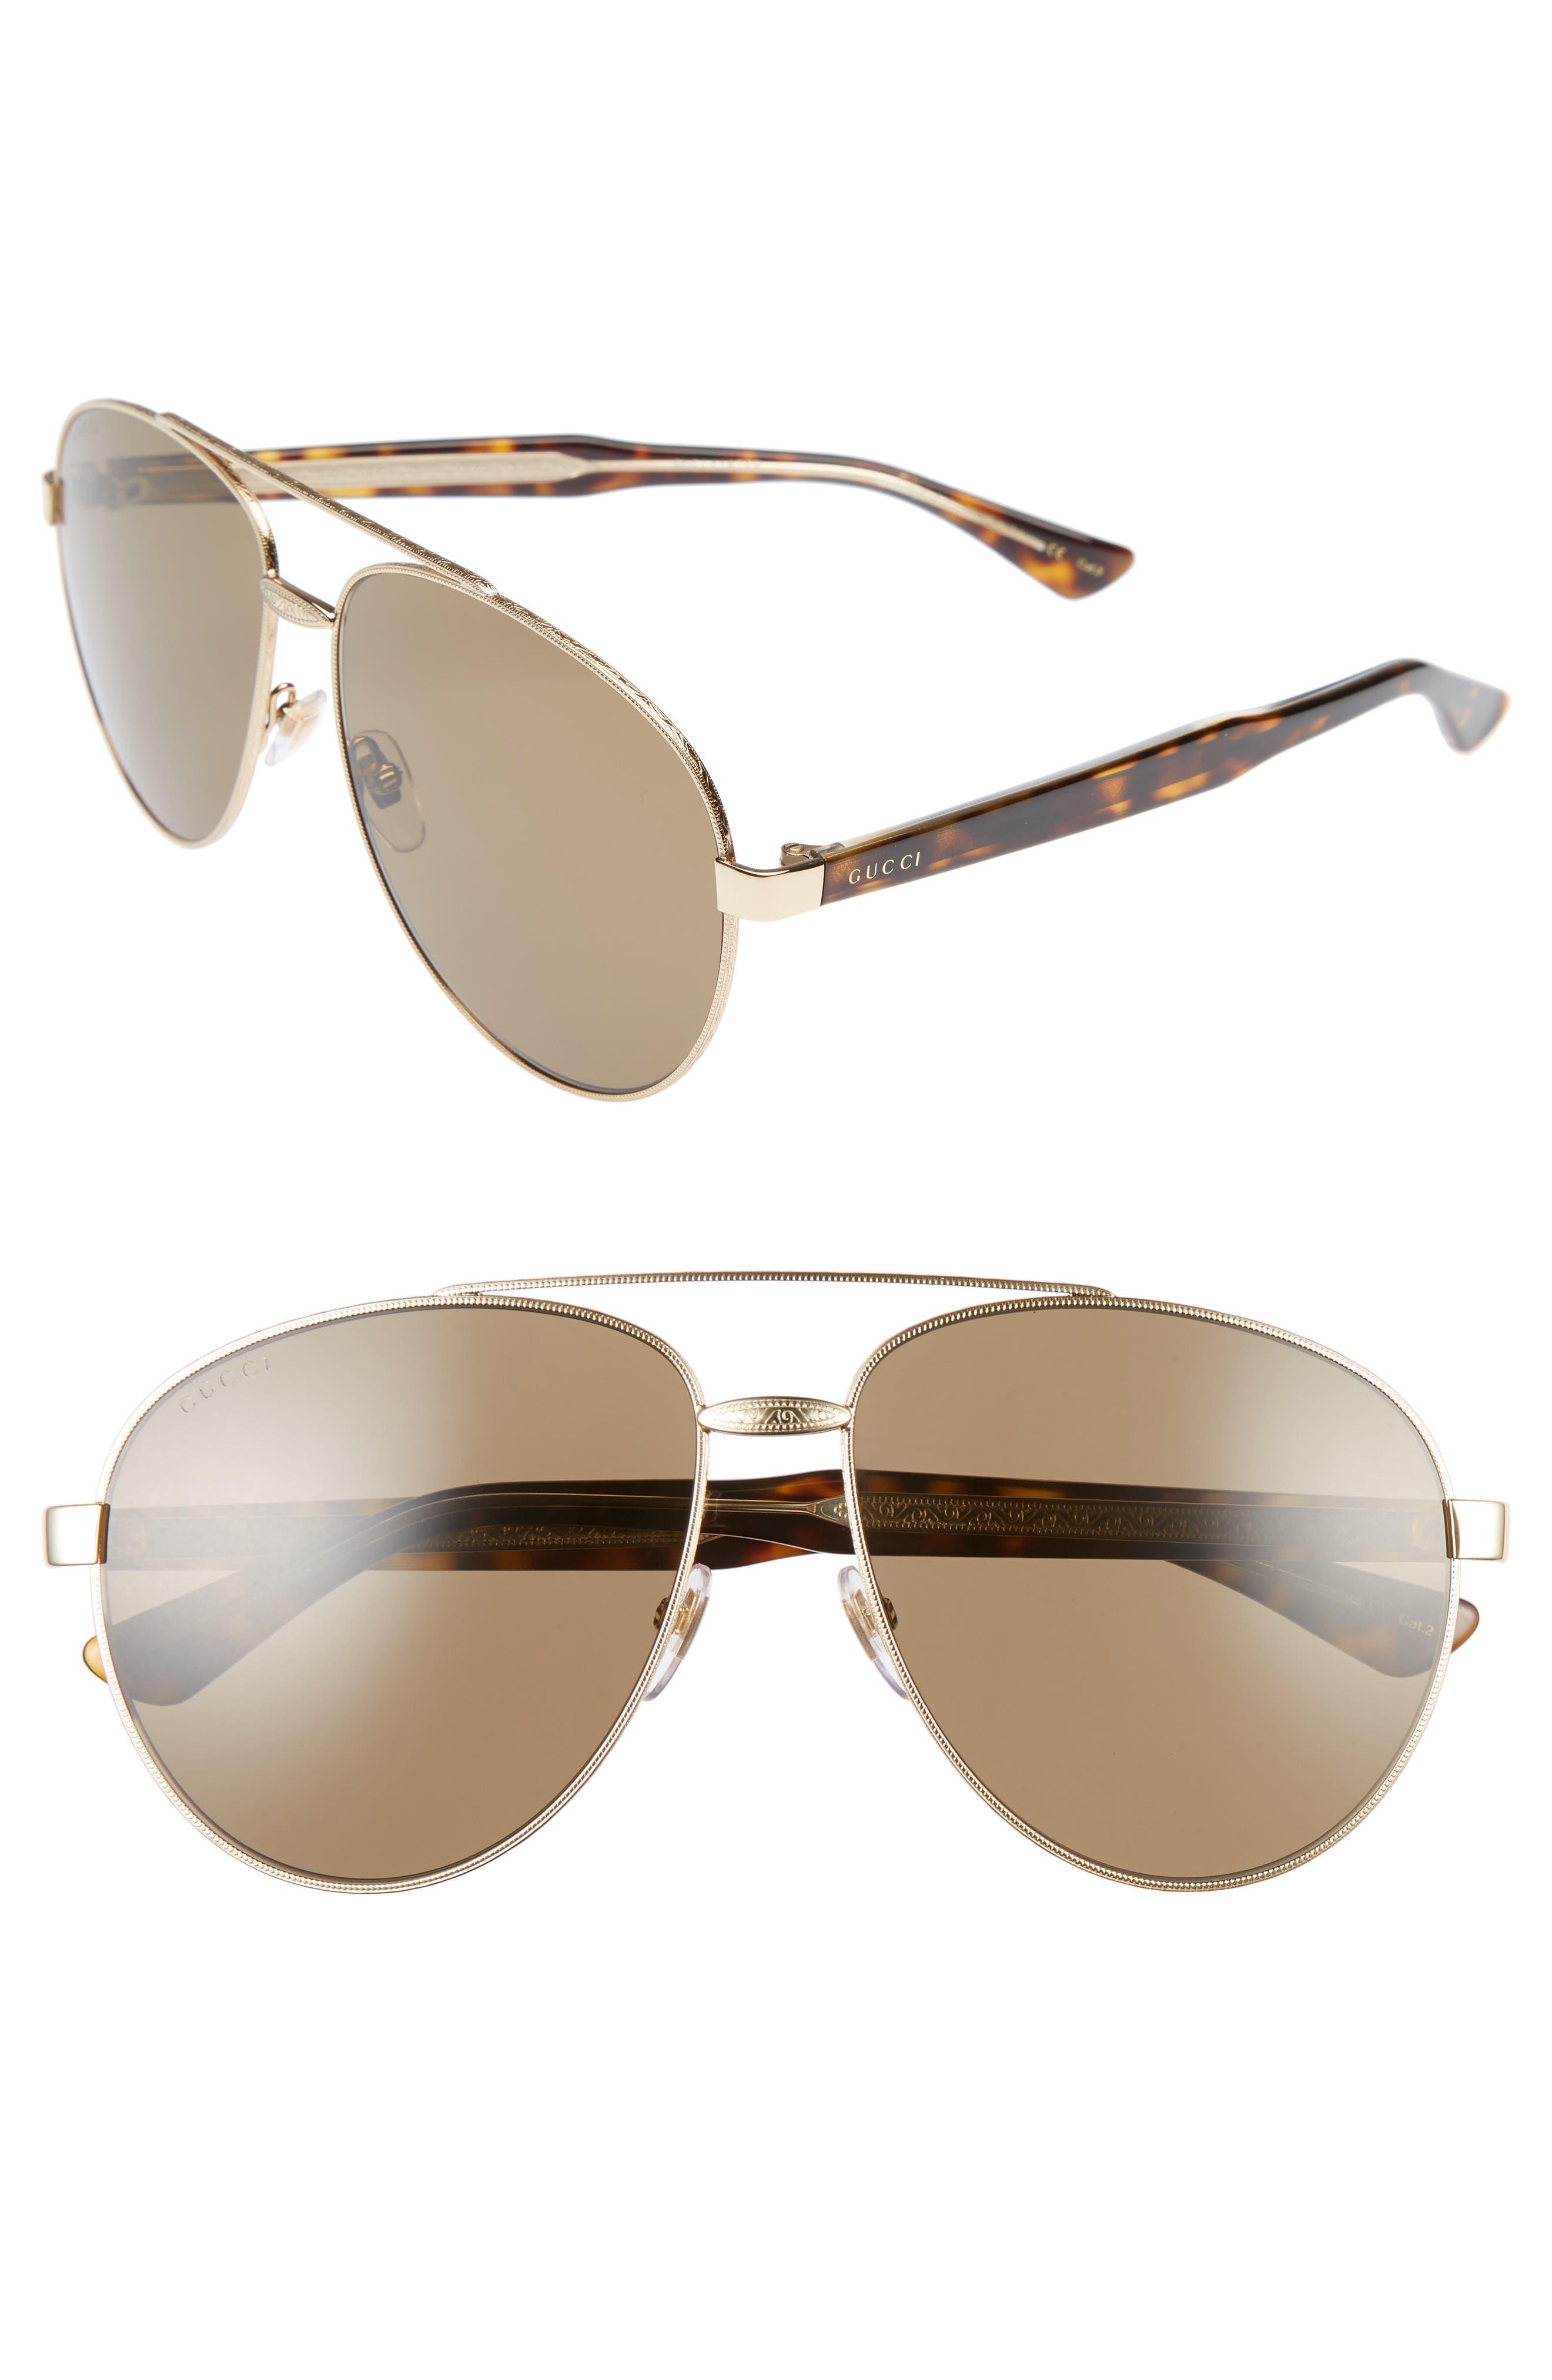 61mm Aviator Sunglasses,                         Main,                         color, Gold/ Brown